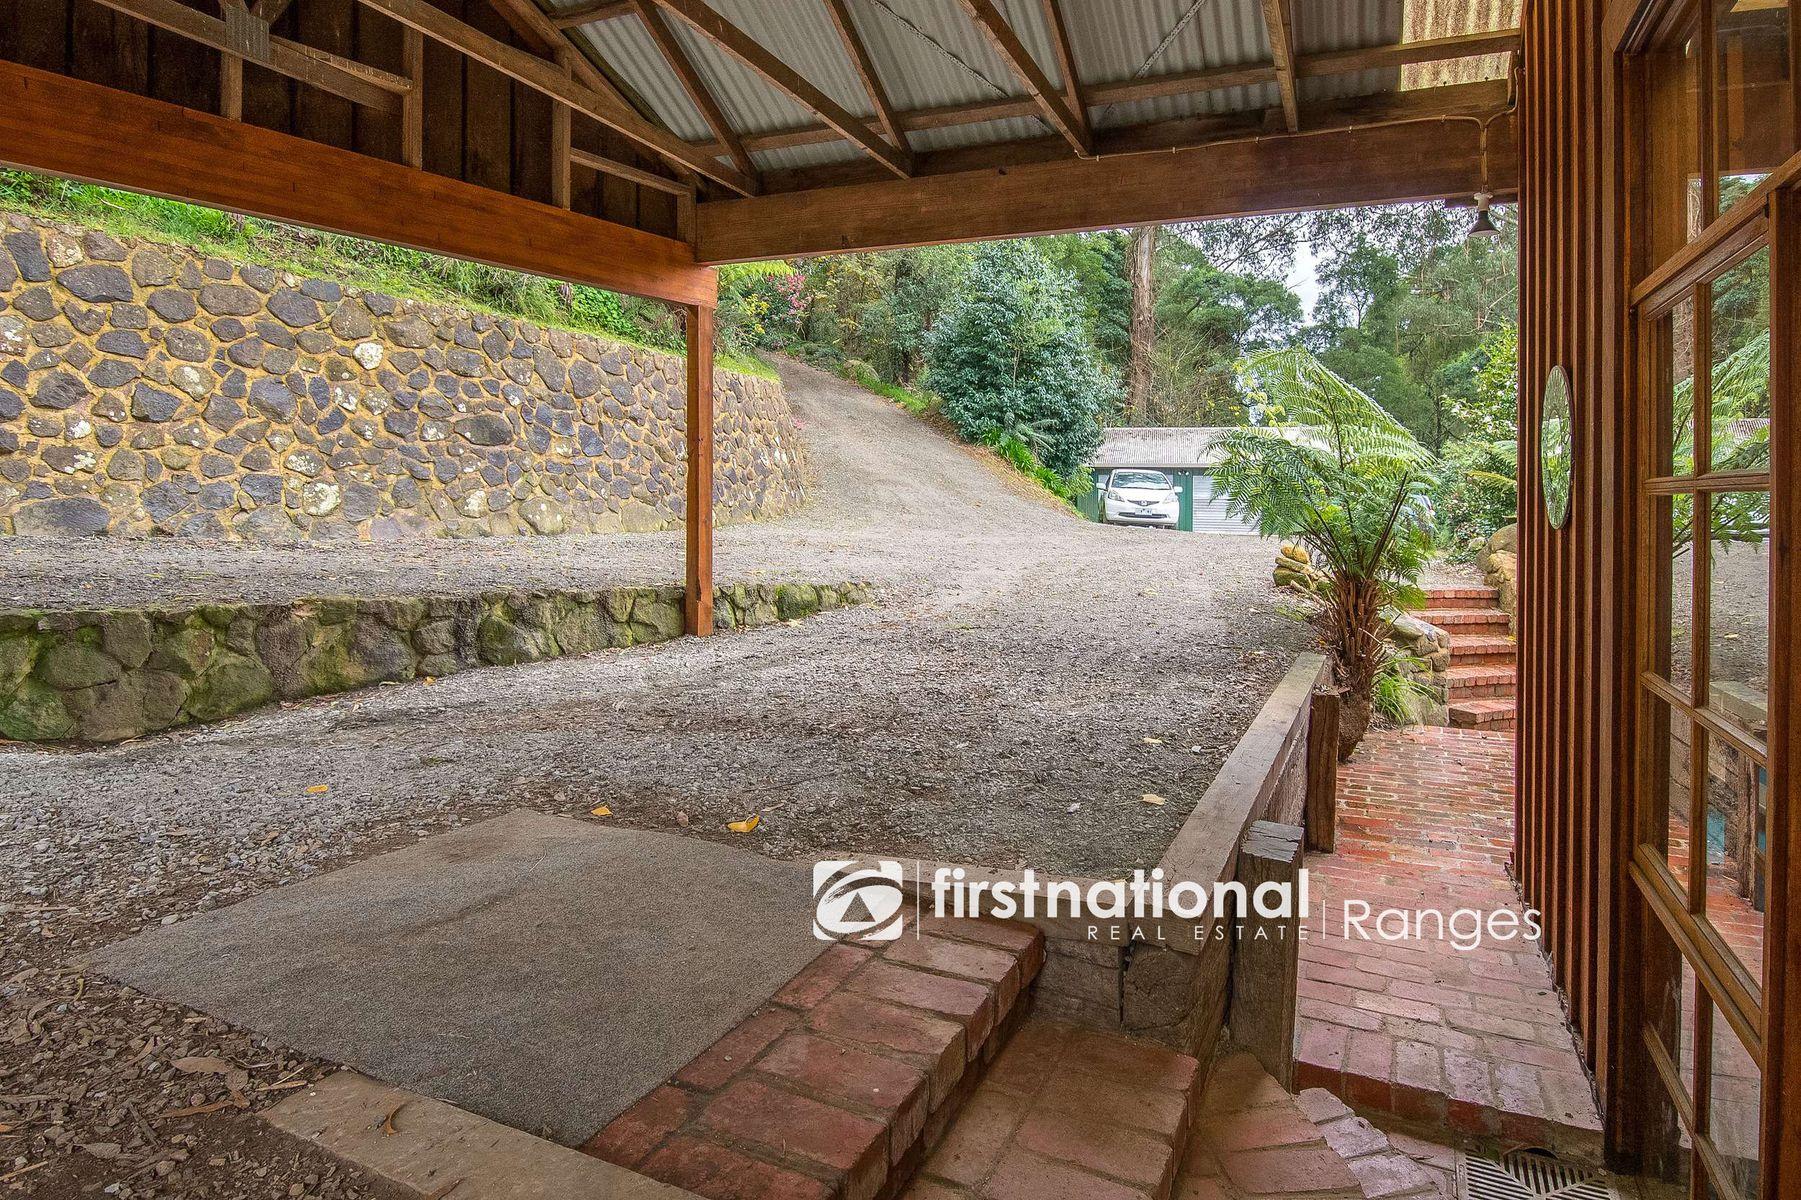 39 Upper Coonara Road, Olinda, VIC 3788